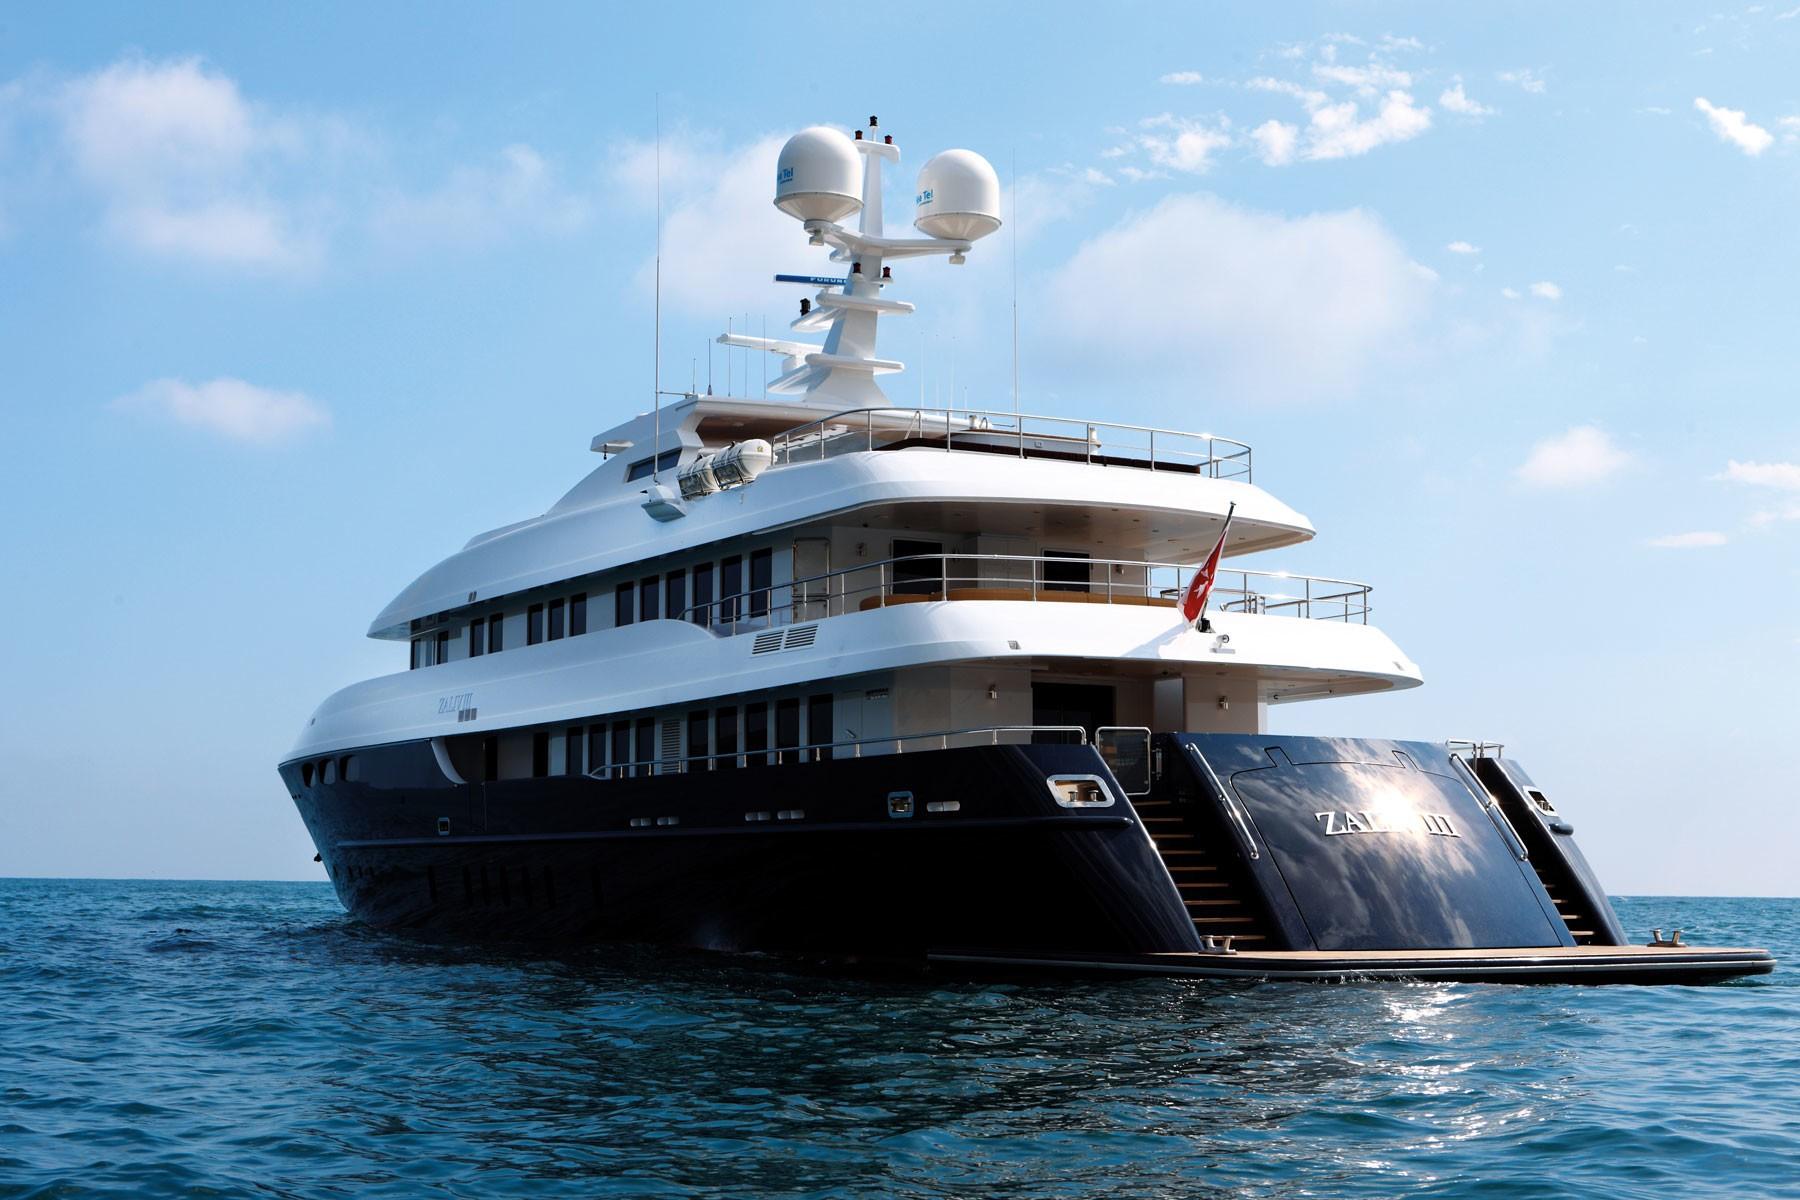 Aft Aspect On Yacht ZALIV III